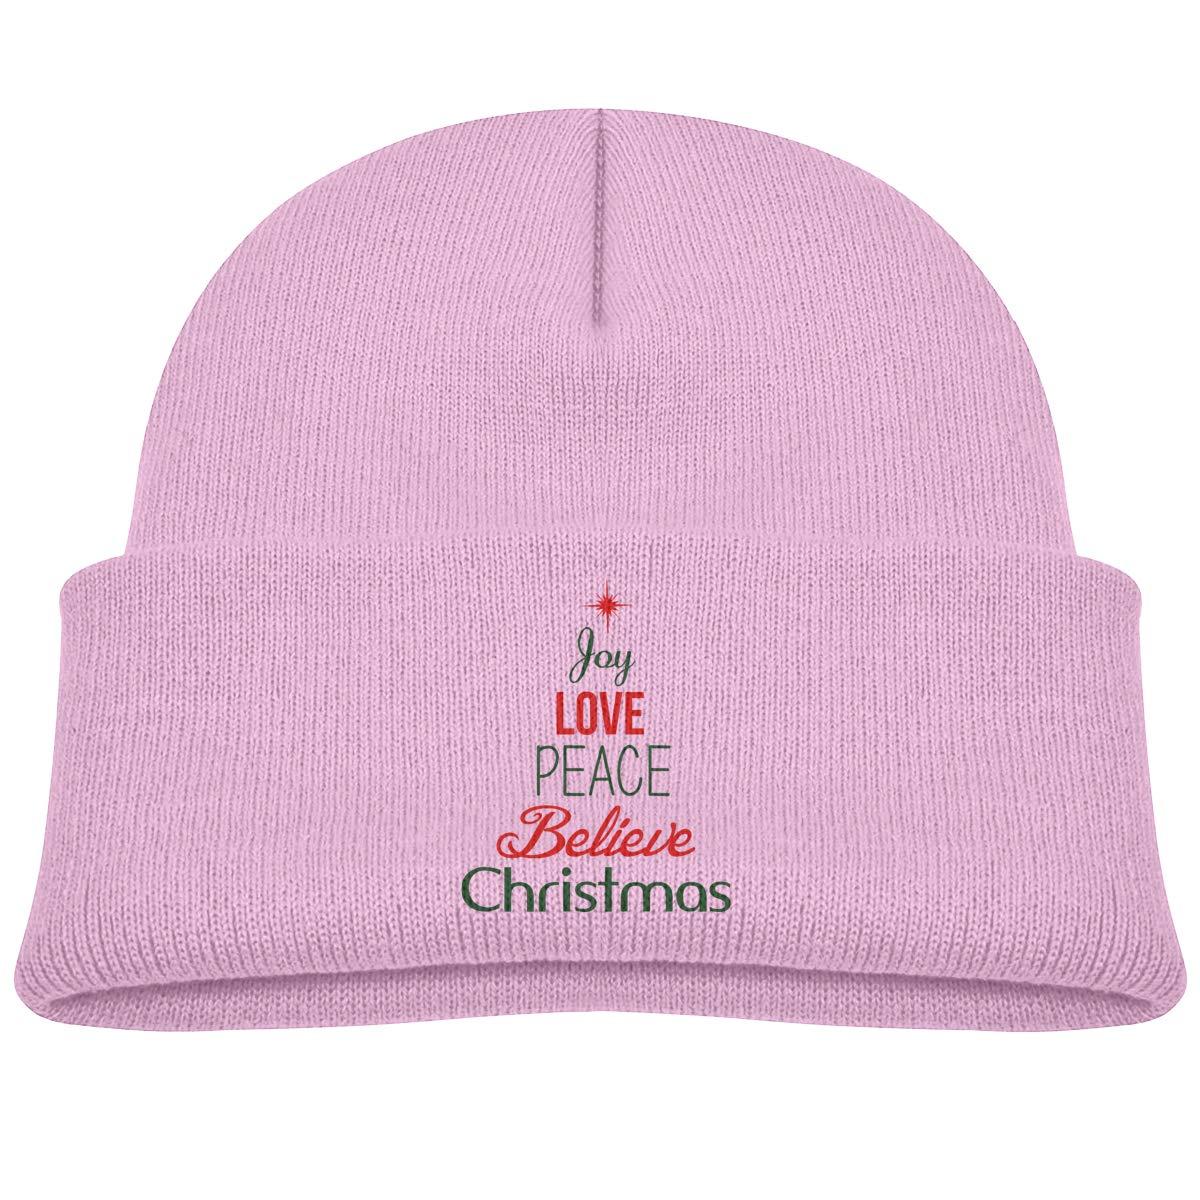 Joy Love Peace Believe Christmas 7 Infant Knit Hats Baby Girls Beanie Cap